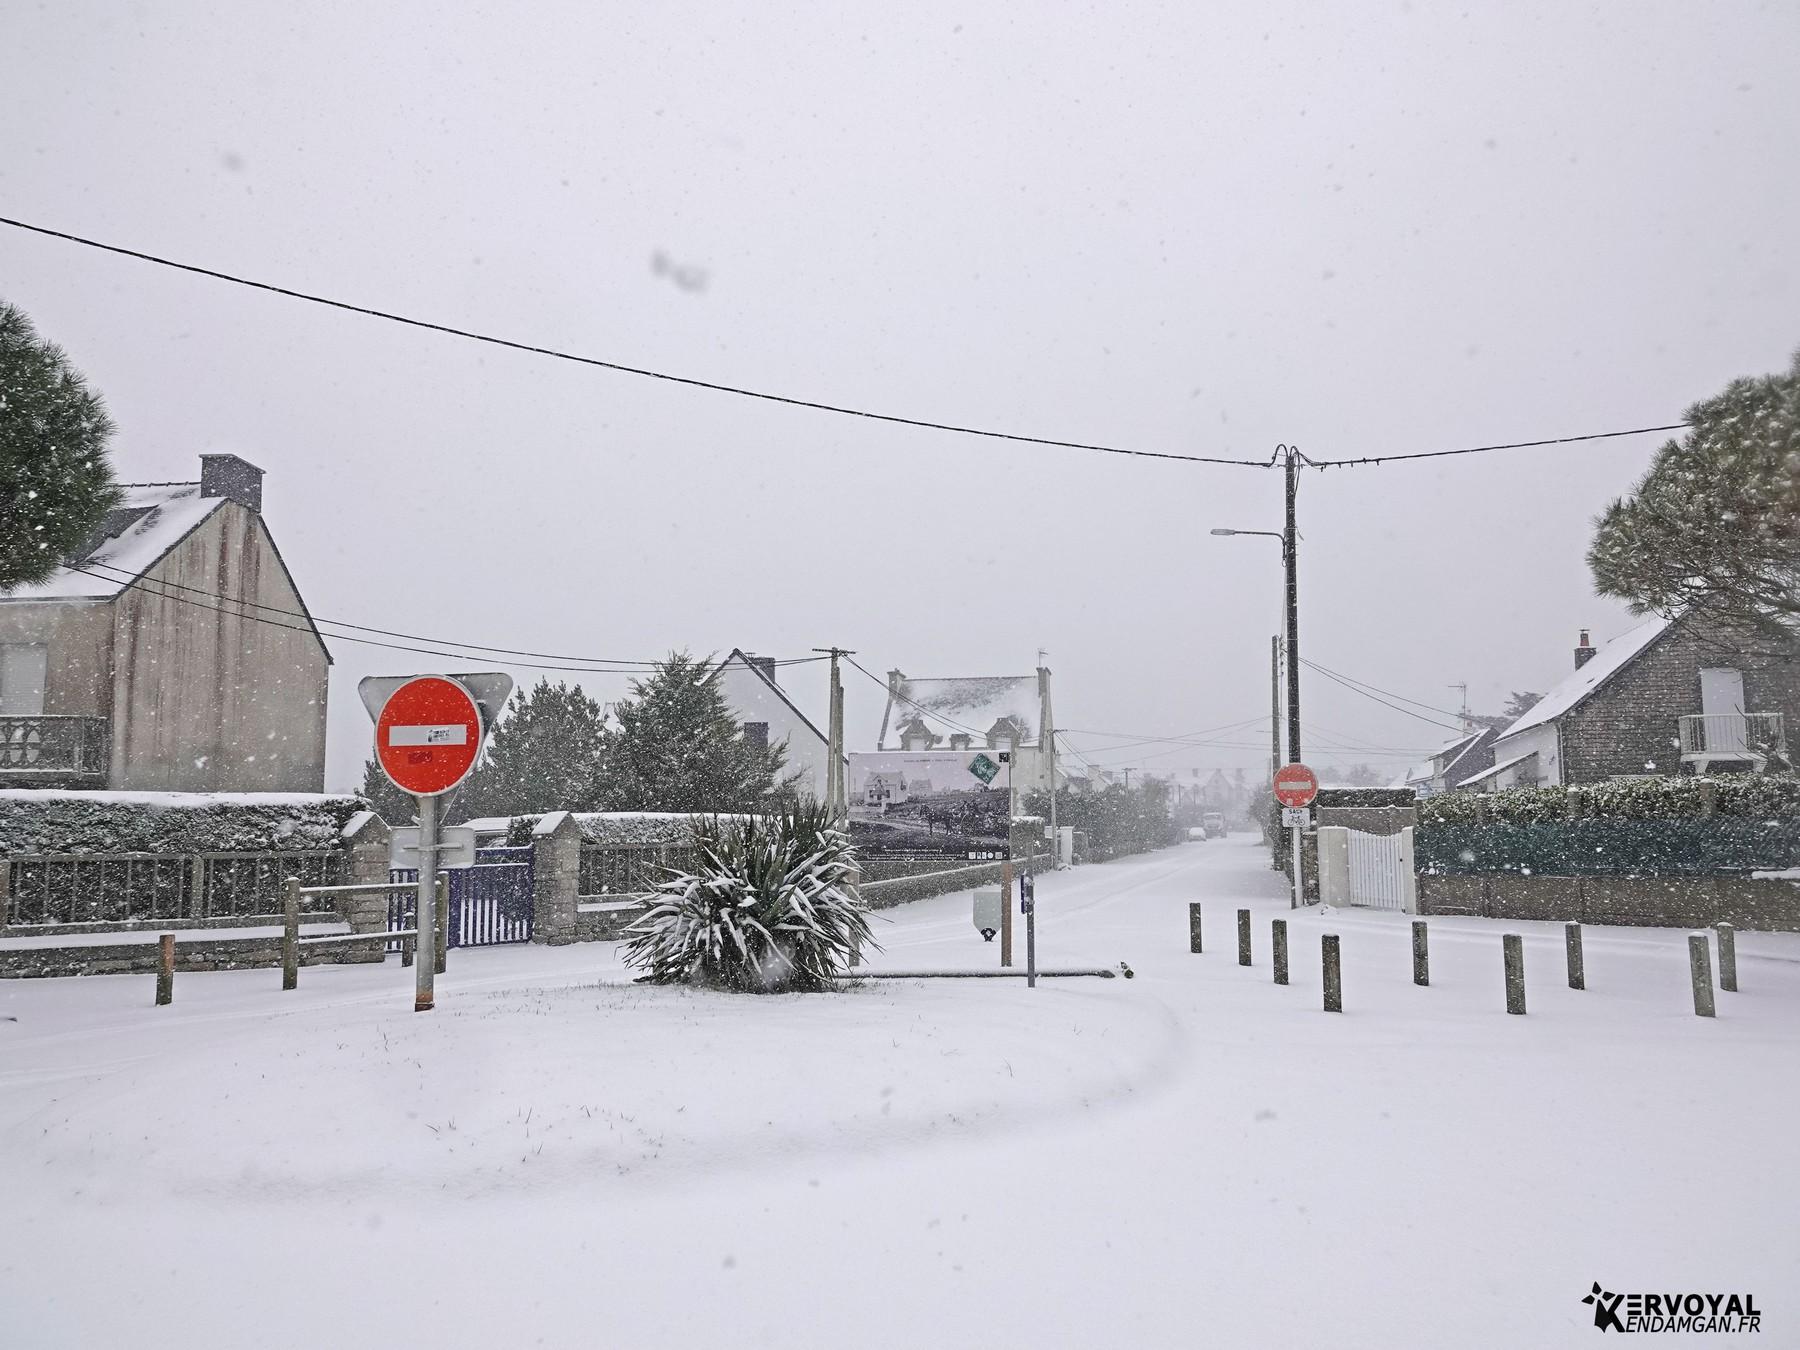 neige à kervoyal 11 février 2021 damgan morbihan (27)